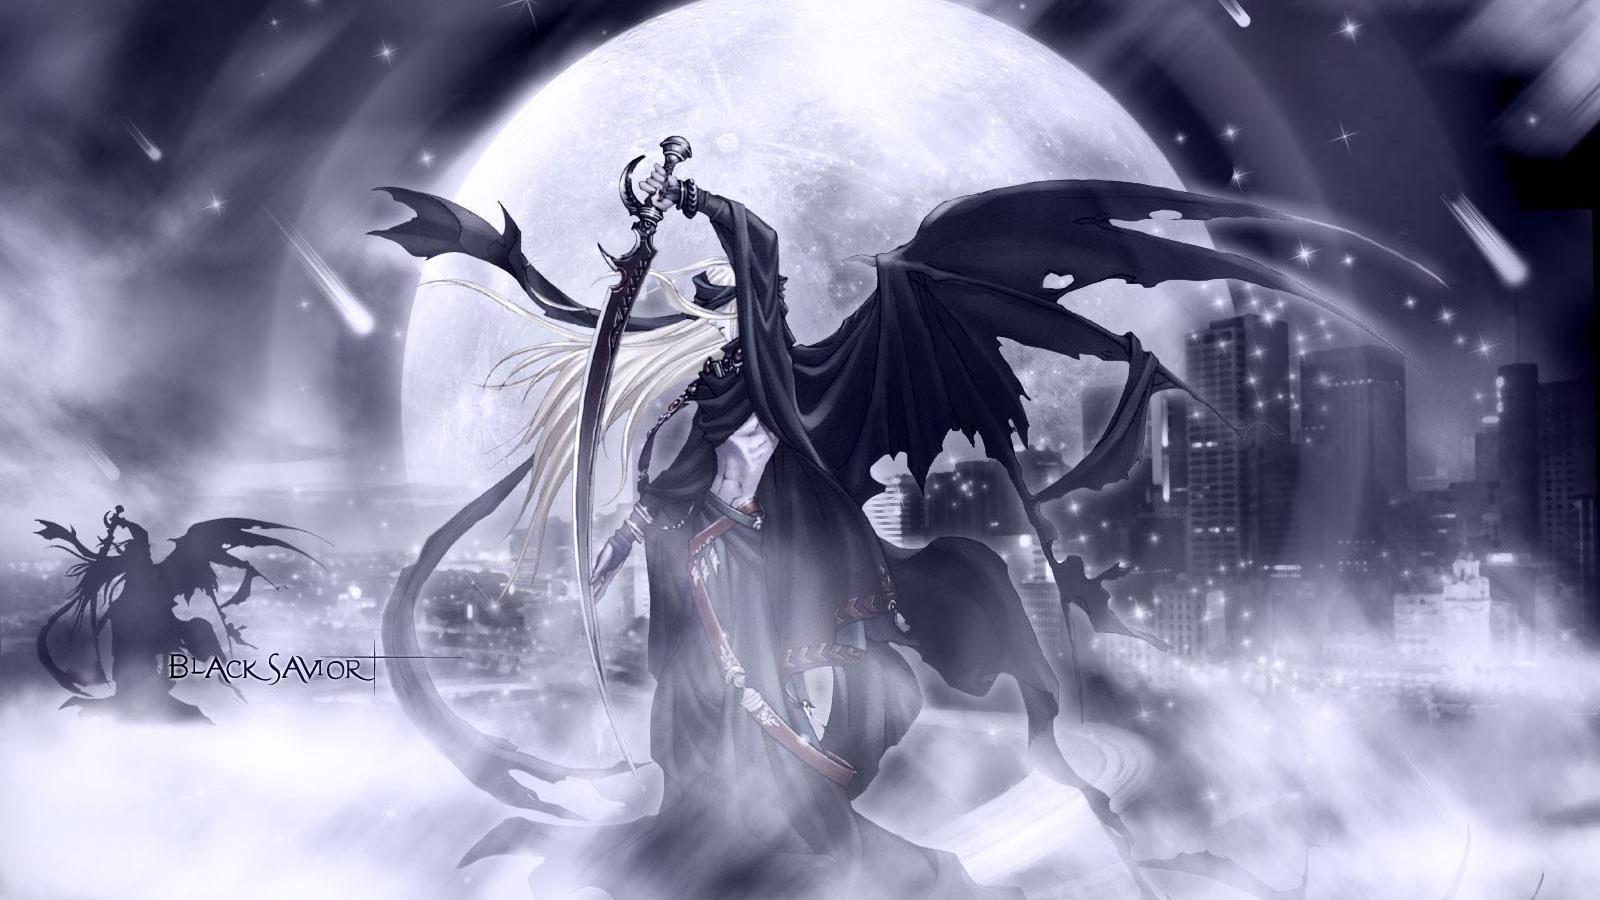 Anime - Black Savior  Wallpaper